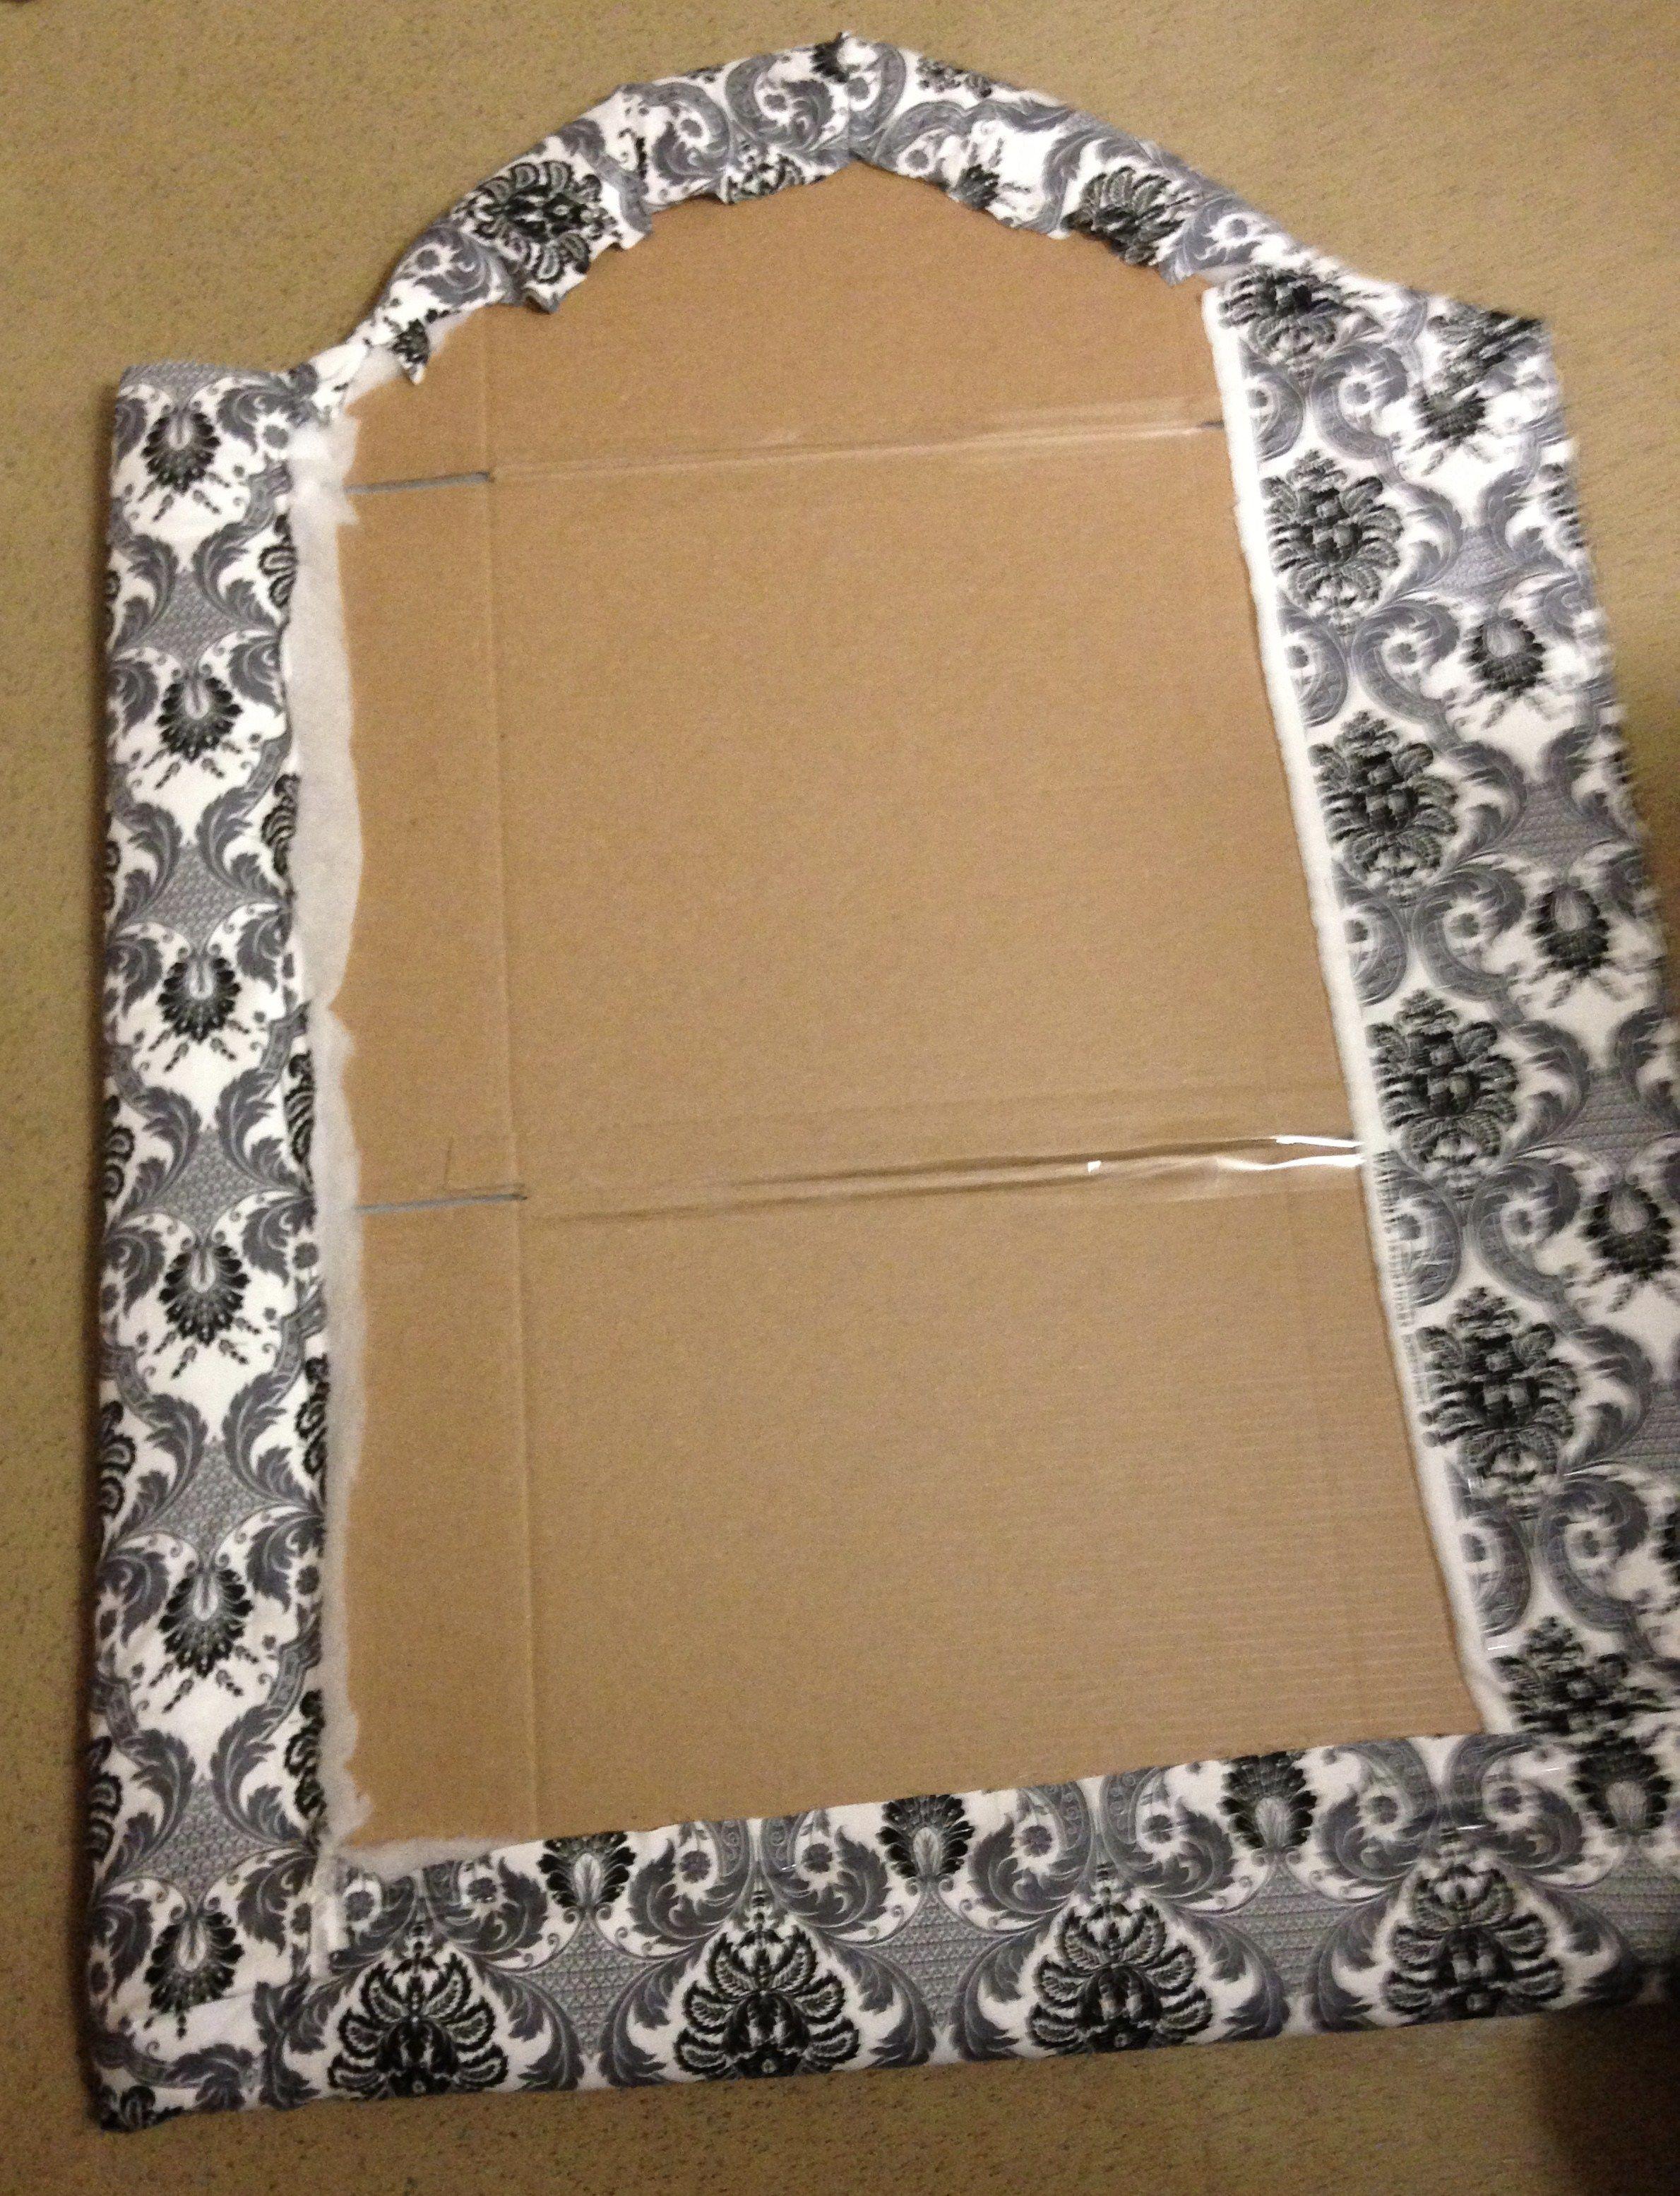 How To Make A Diy Dorm Room Headboard Dorm Room Headboards Diy